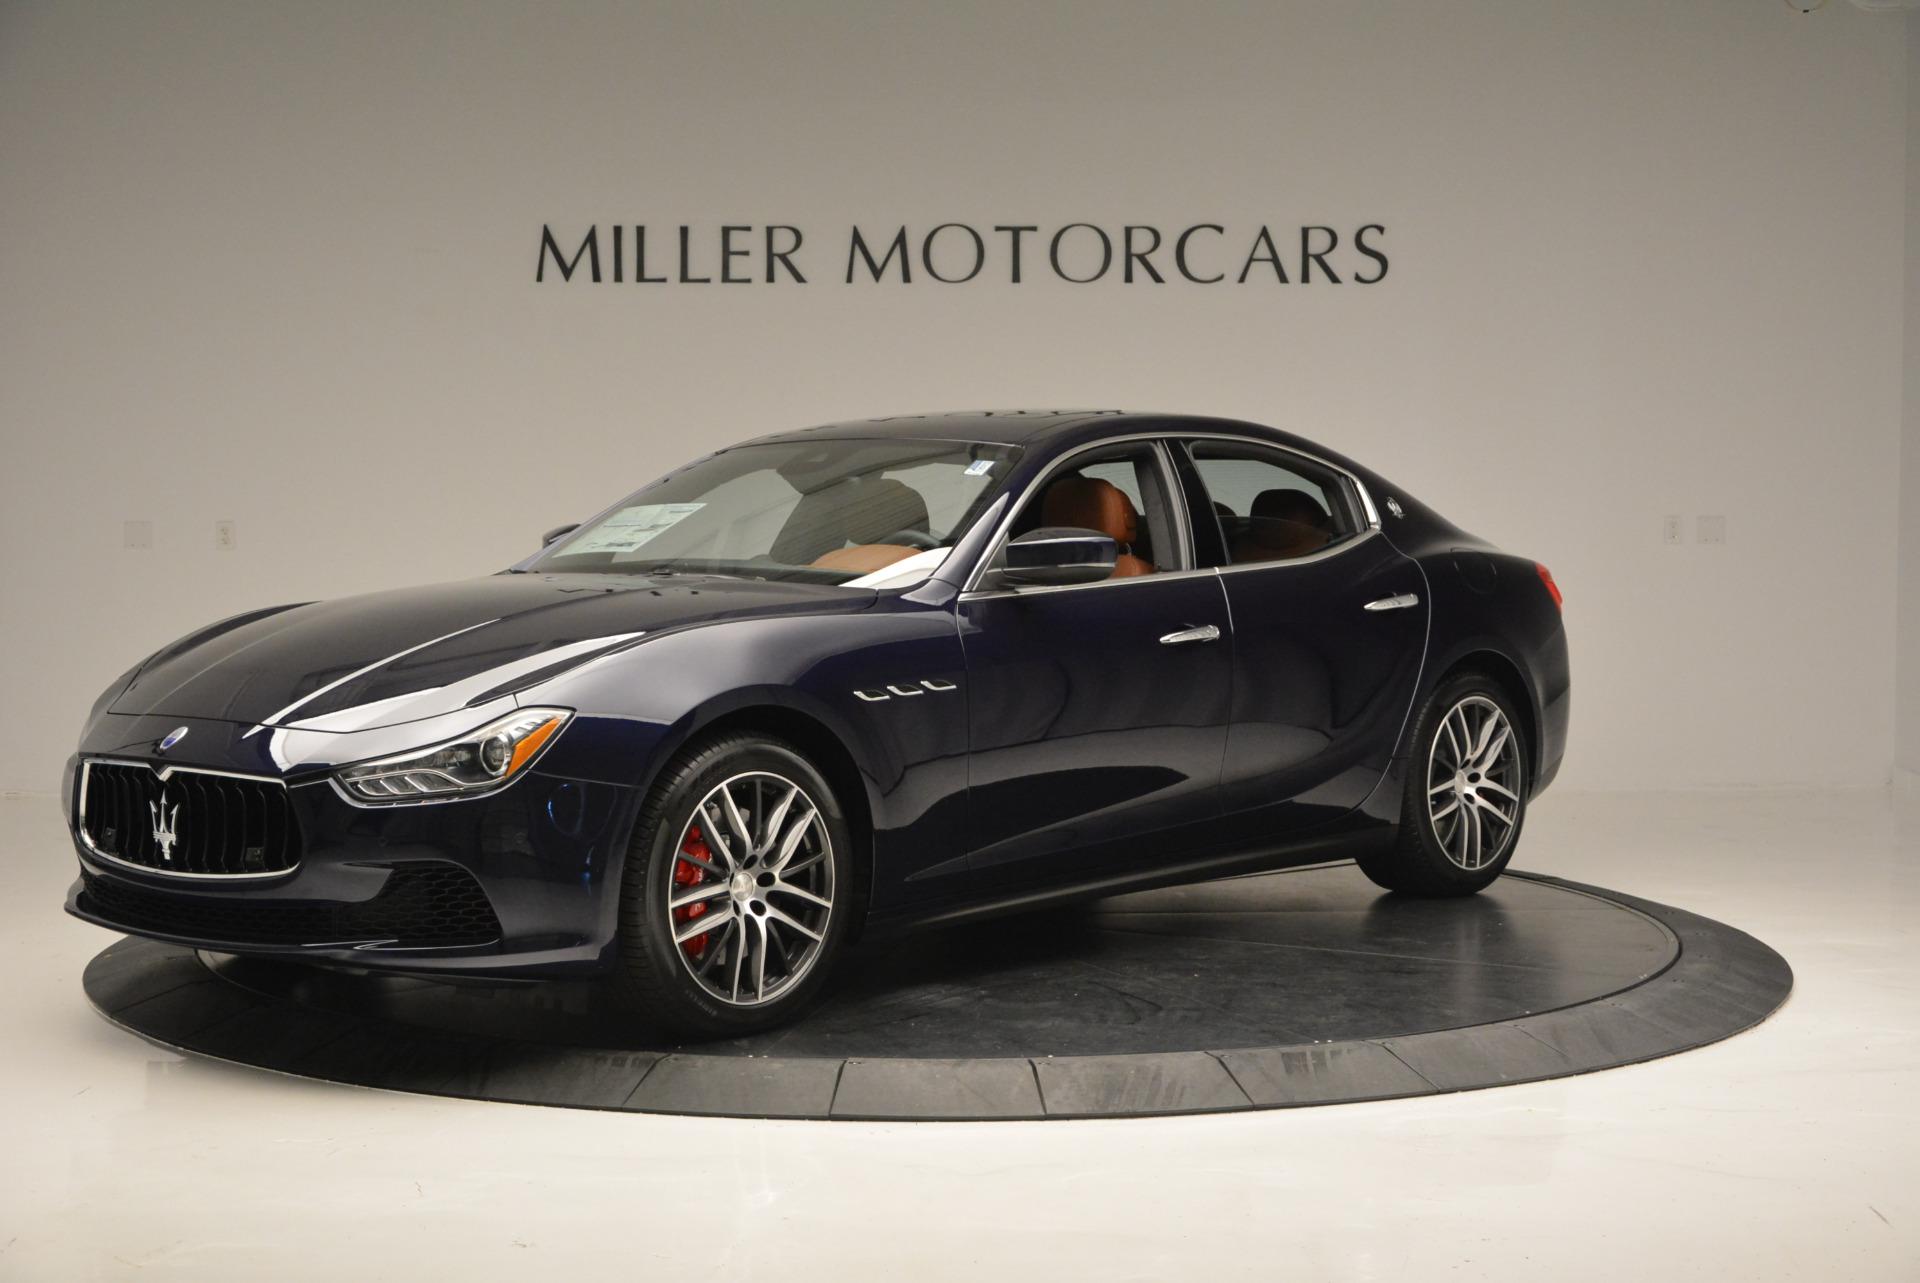 New 2017 Maserati Ghibli S Q4 For Sale In Westport, CT 569_p2